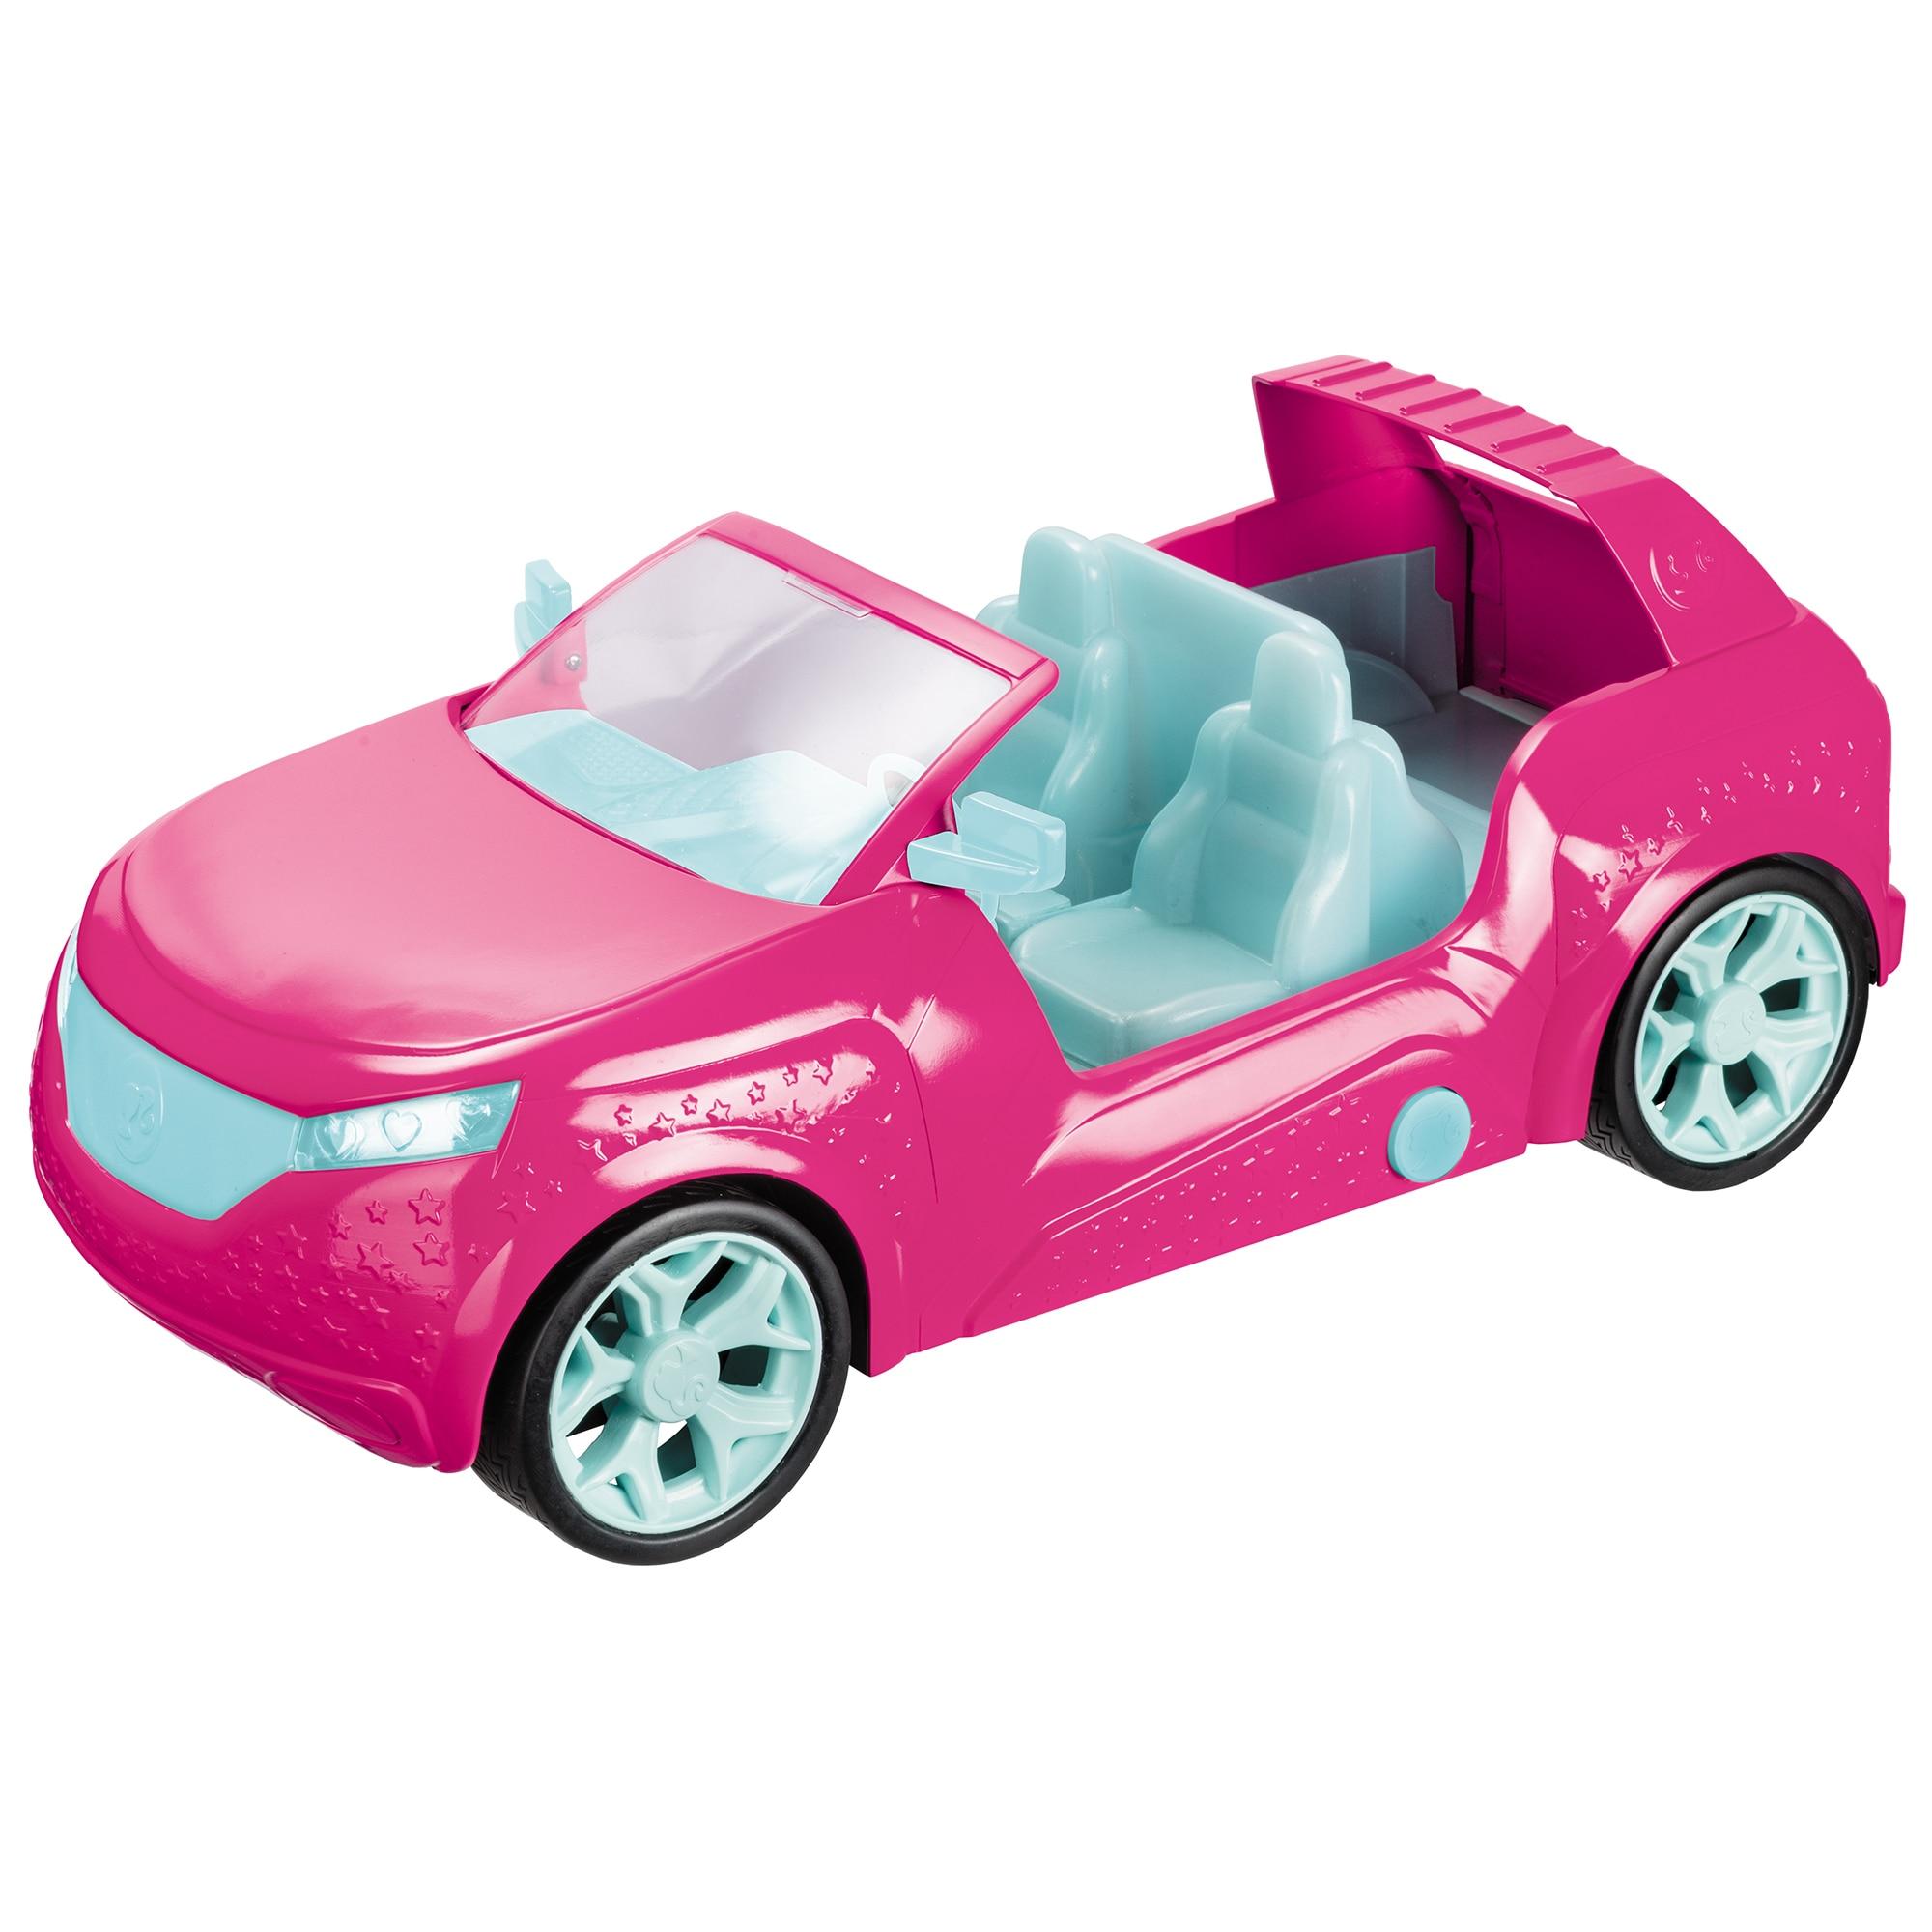 Rc Barbie Cruiser Jatek Auto Emag Hu